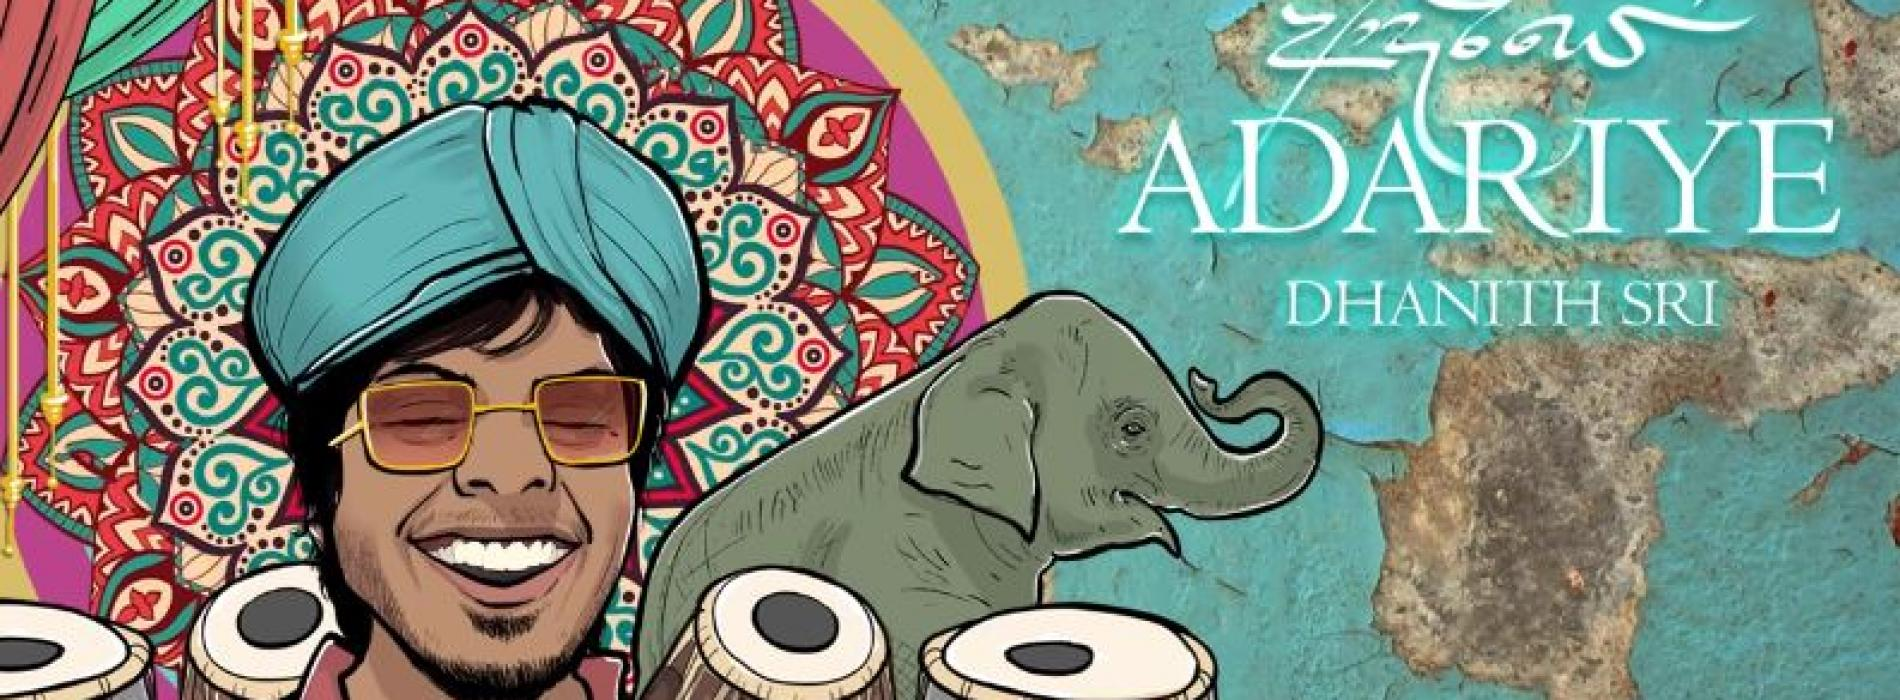 New Music : Dhanith Sri – Adariye (ආදරියේ) Official Lyric Video | Album Alokawarsha